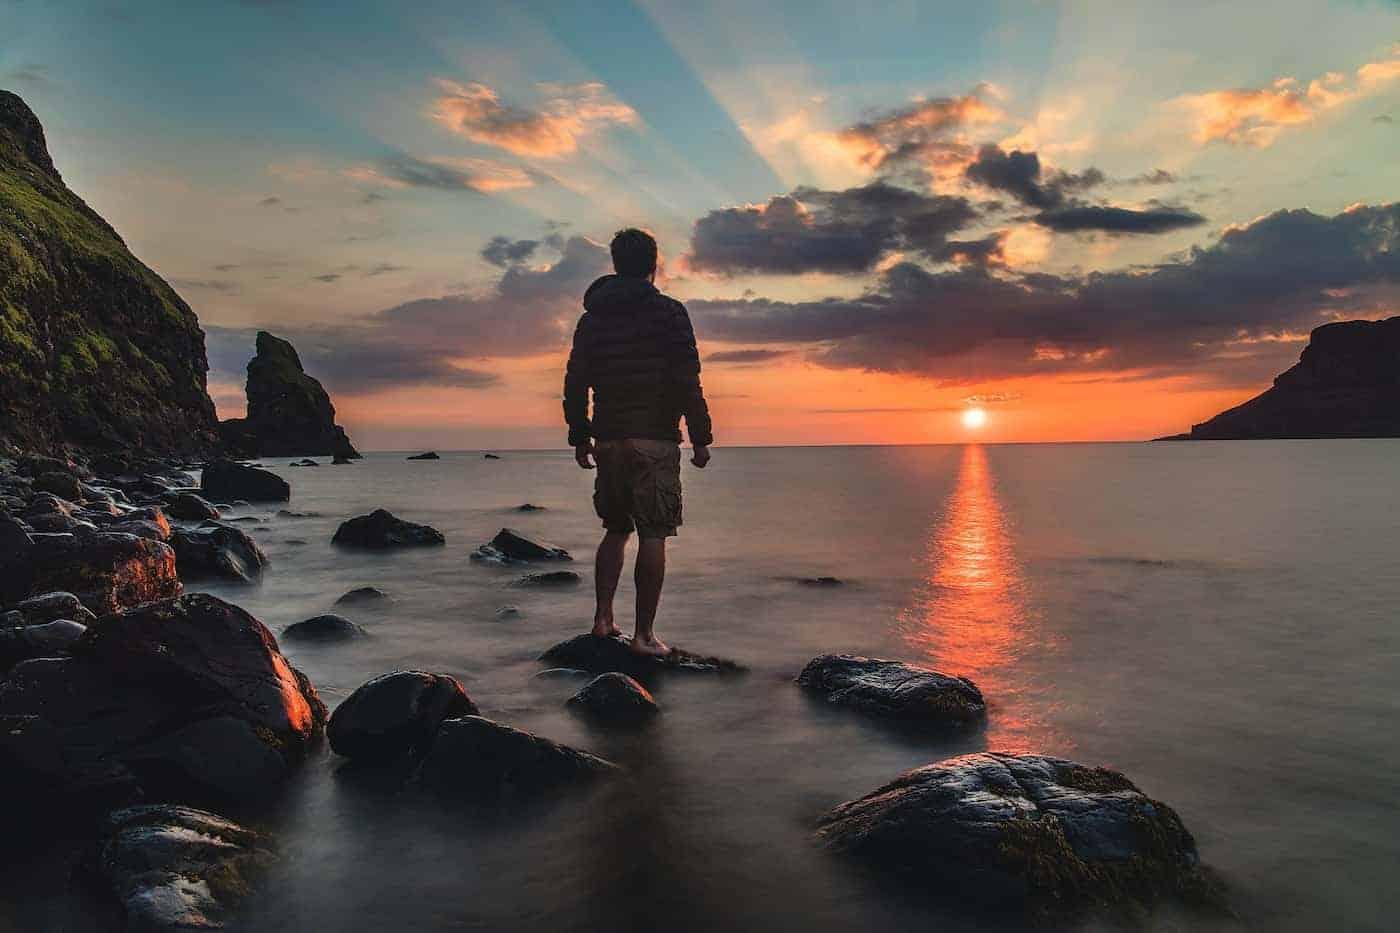 atardecer-sunset-joshua-earle